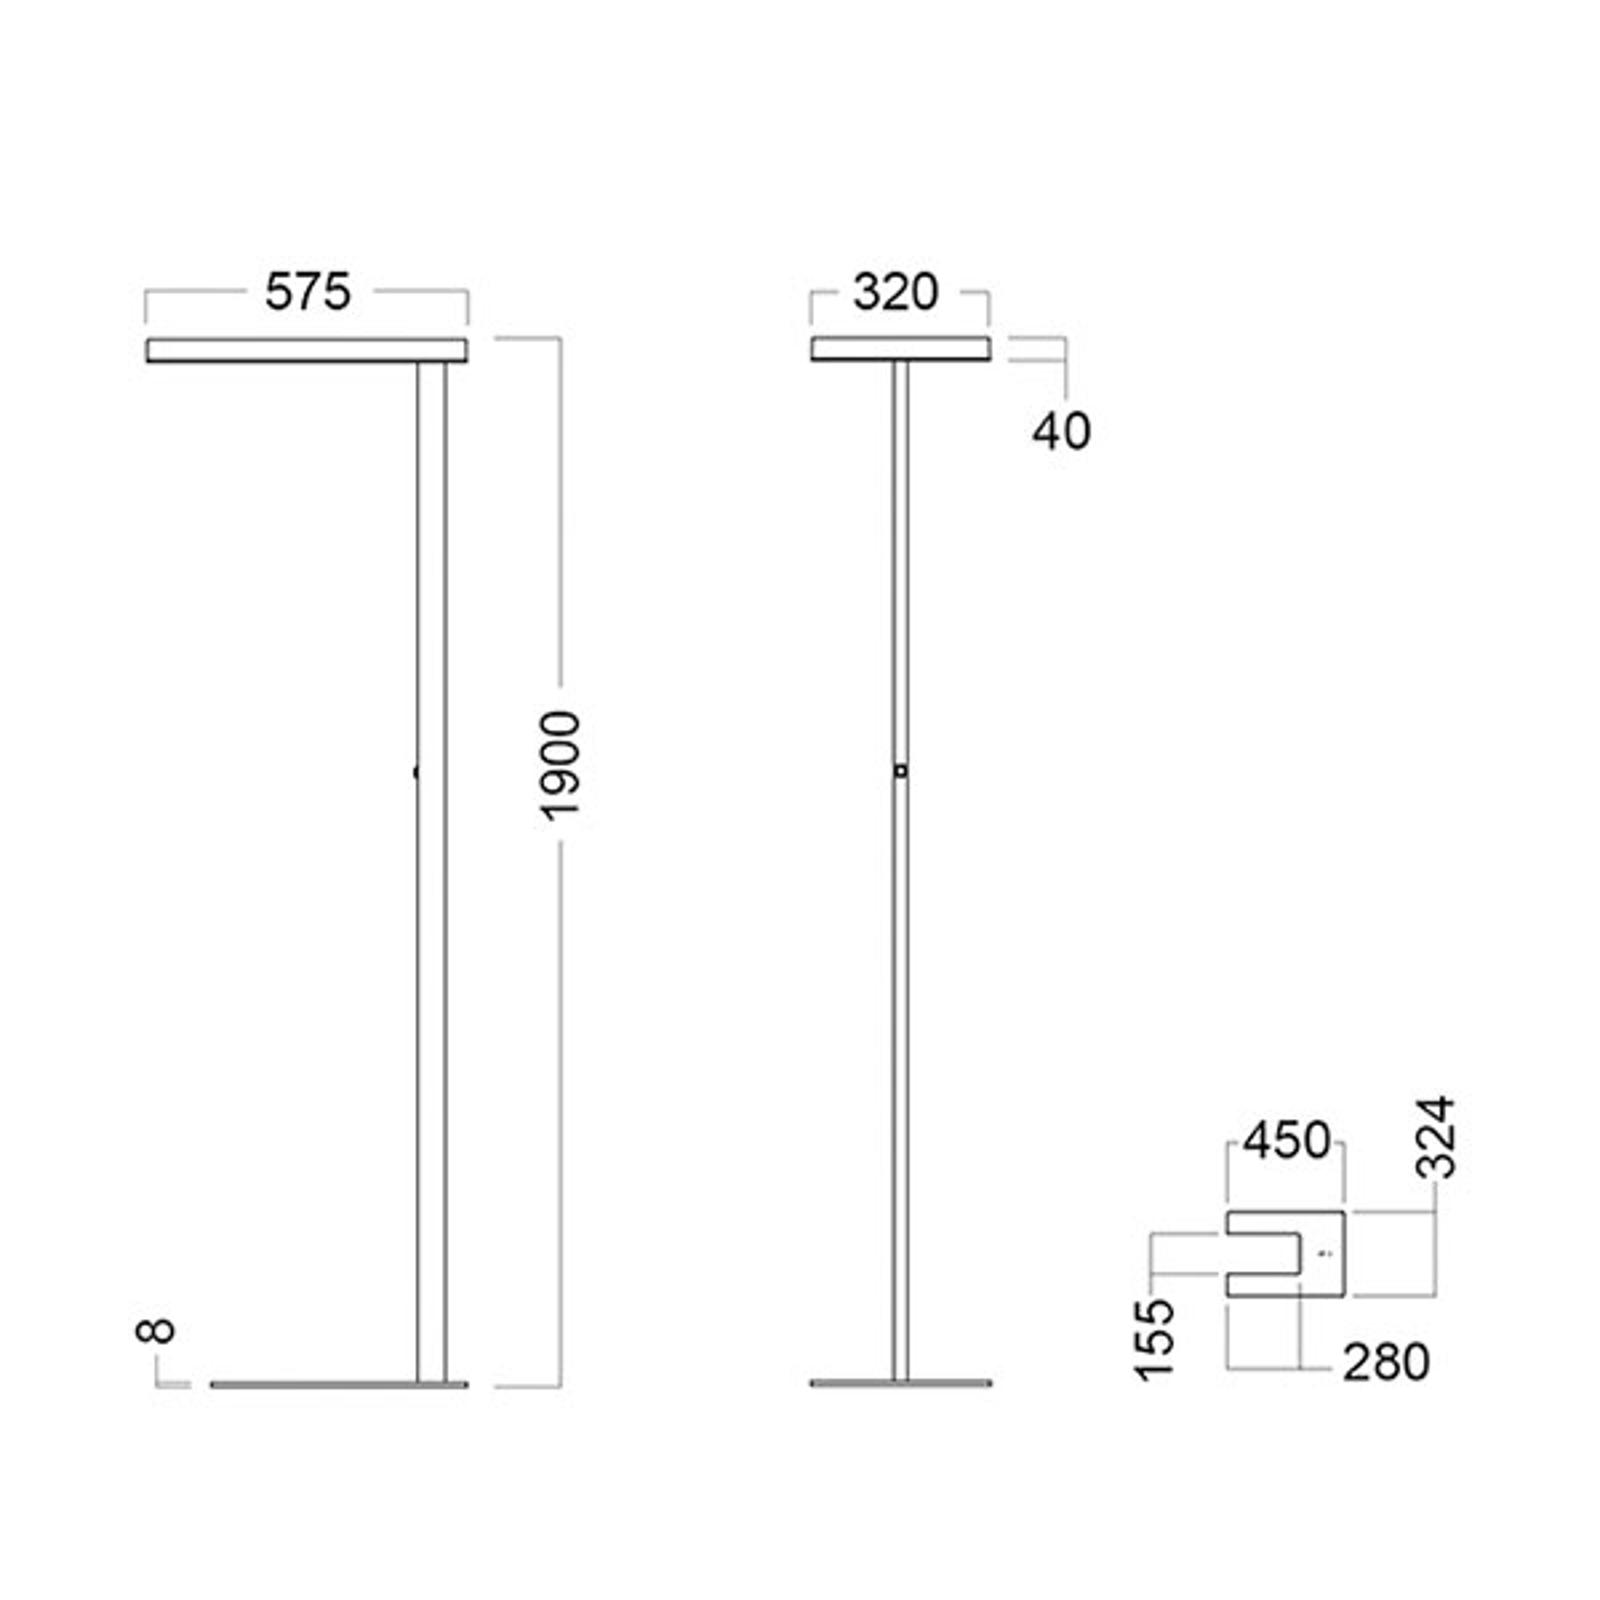 LED-lattiavalo Free-F 4 000 K tunnistin harmaa